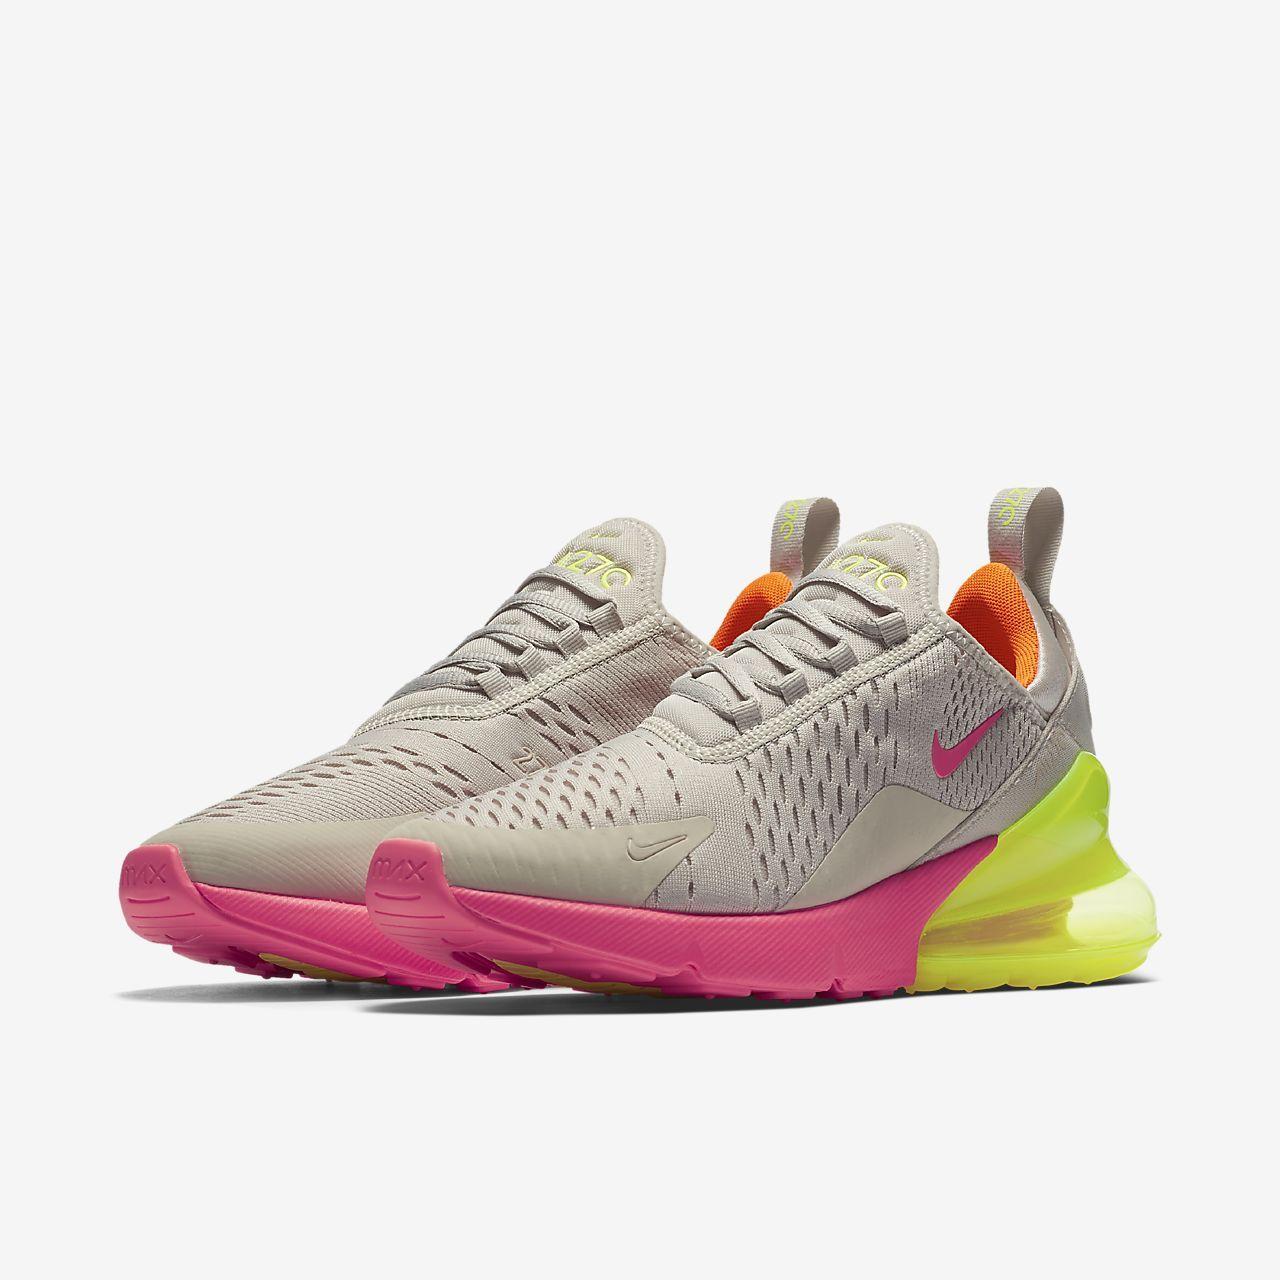 Nike Air Max 270 Women's Shoe #ad | Womens sneakers, Best